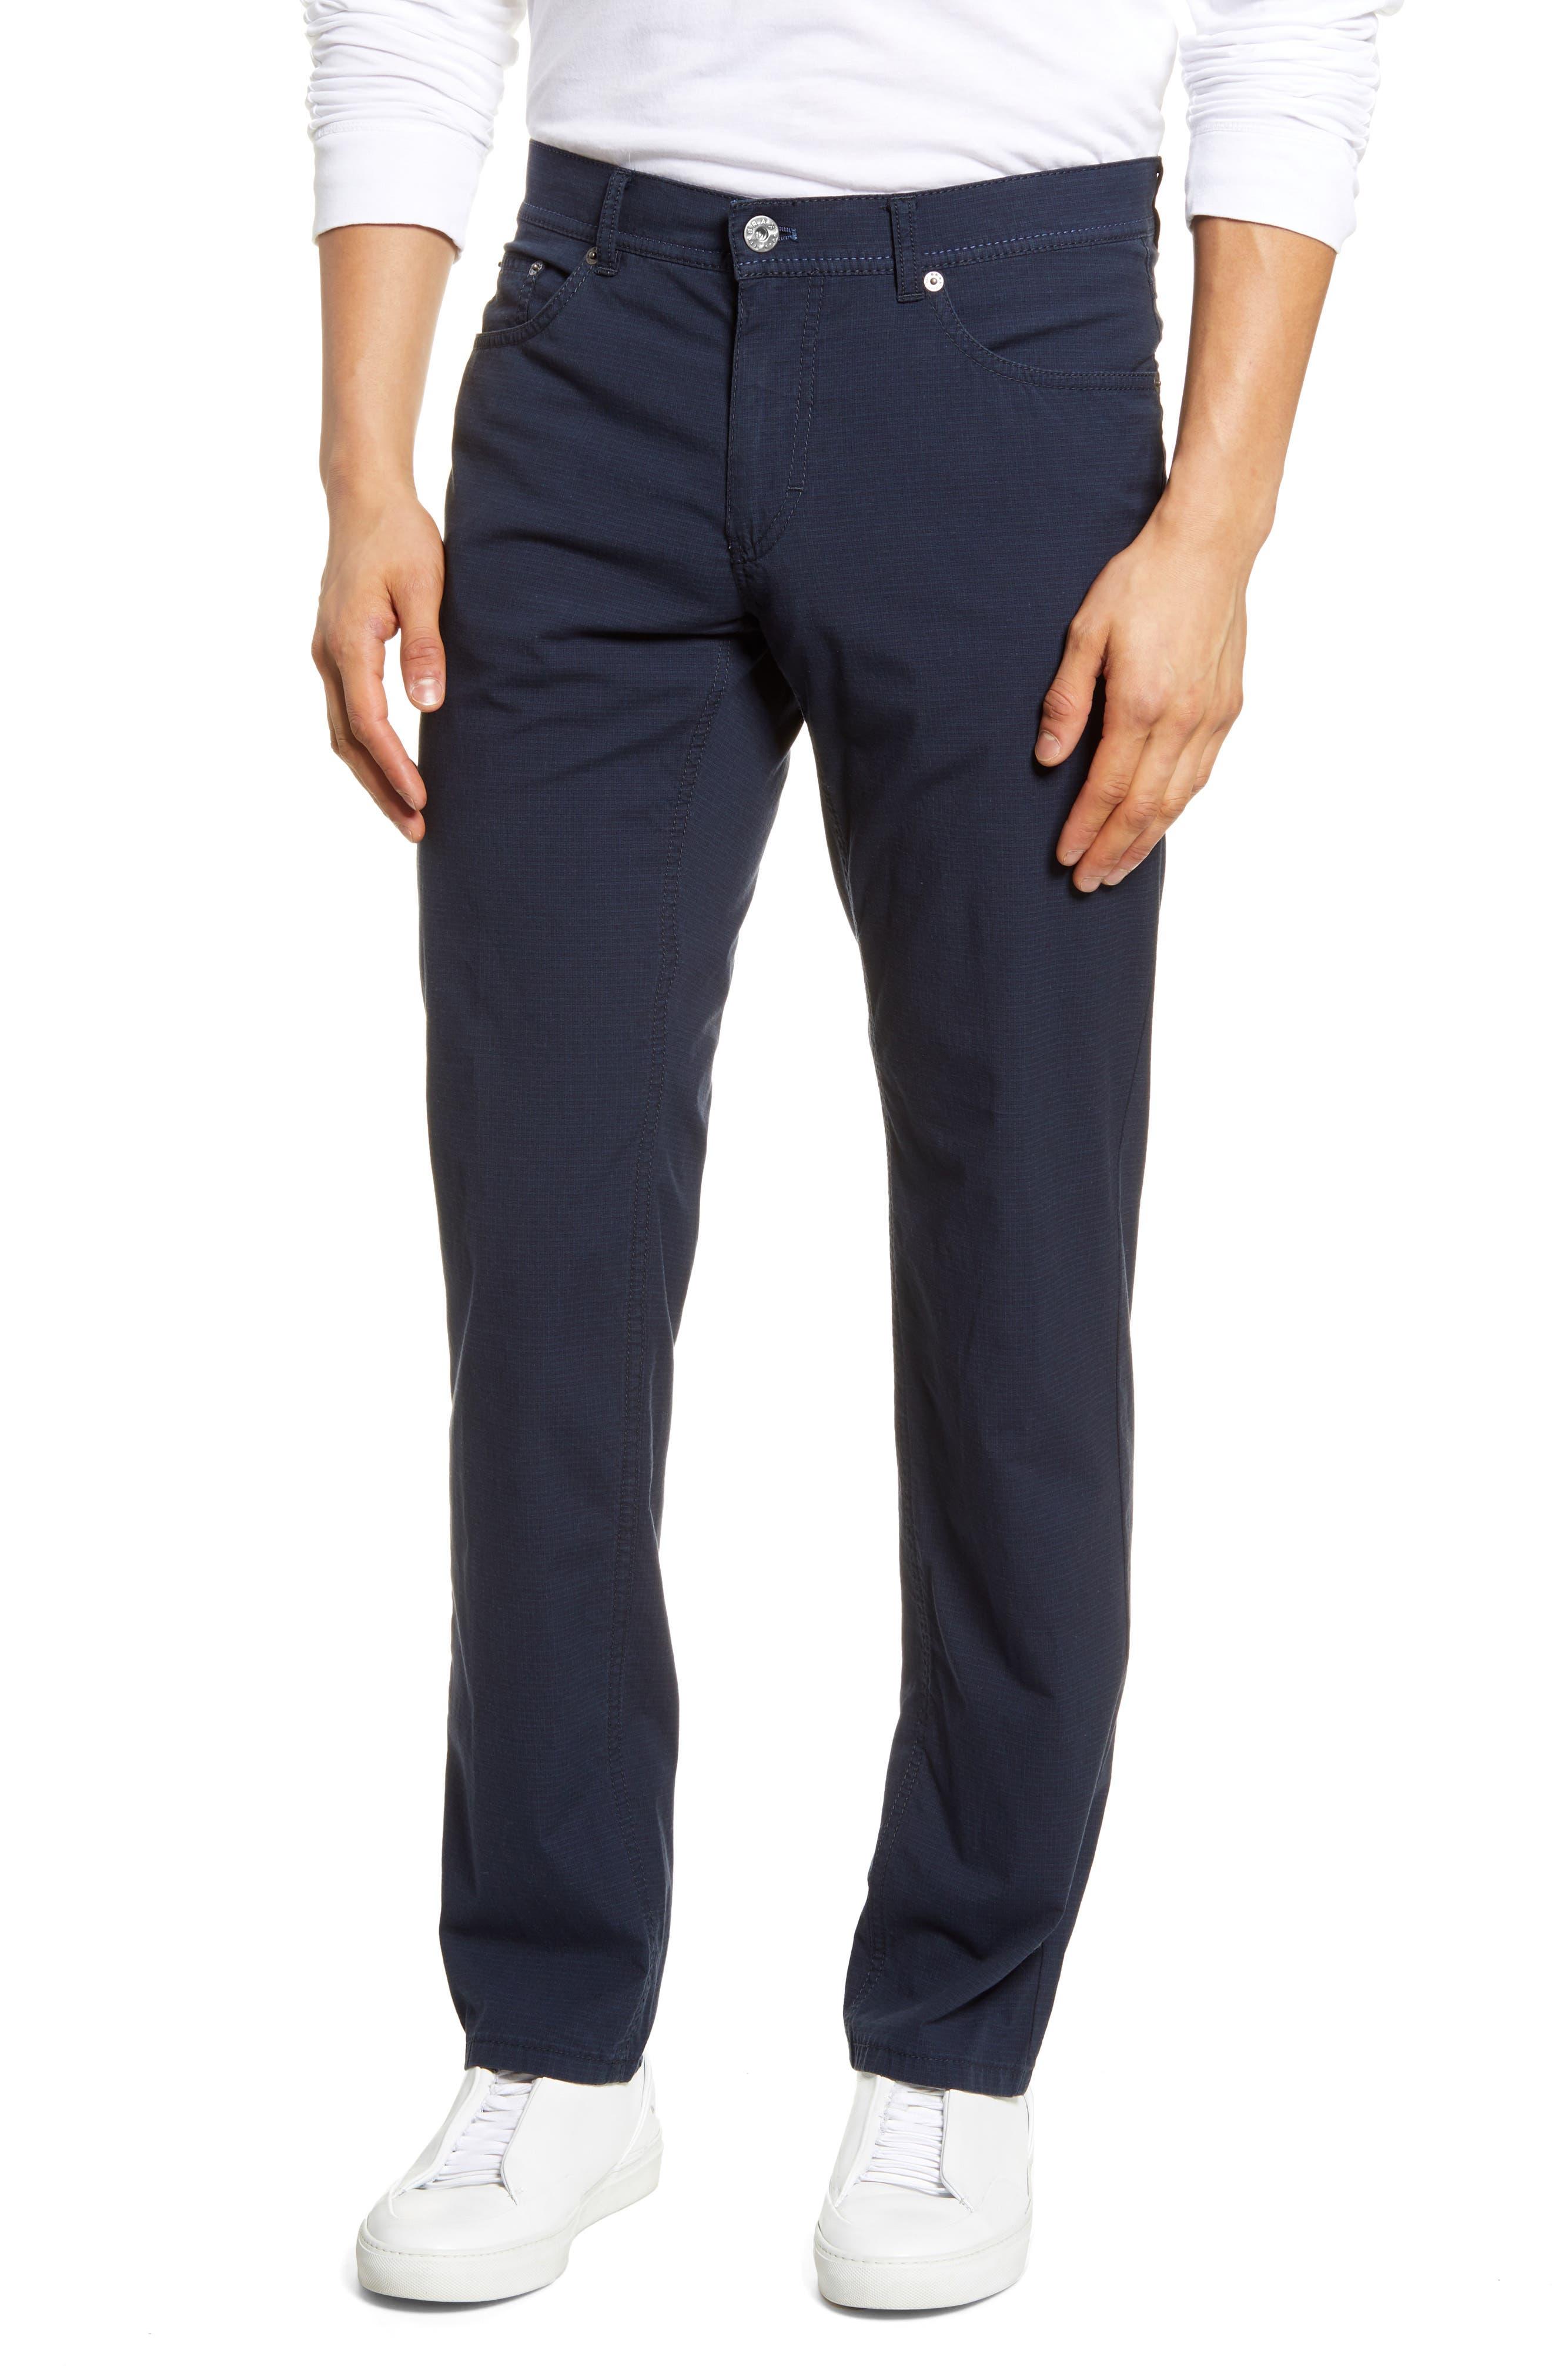 Cooper Fancy Hurricane Slim Fit Pants